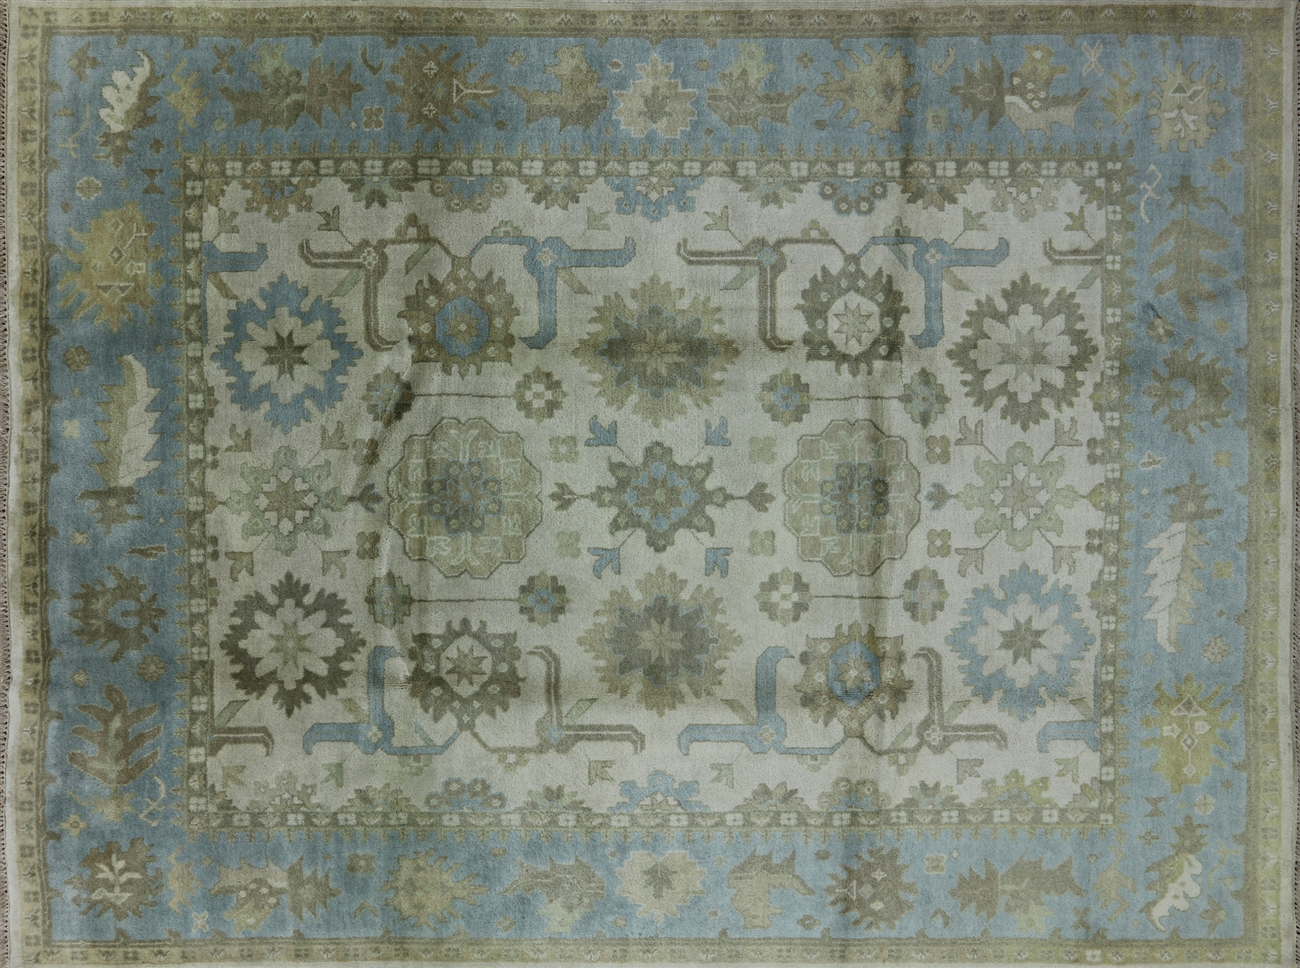 New 9u0027x12u0027 Ivory Baby Blue Border Oushak Hand Knotted Wool Area Rug H5481